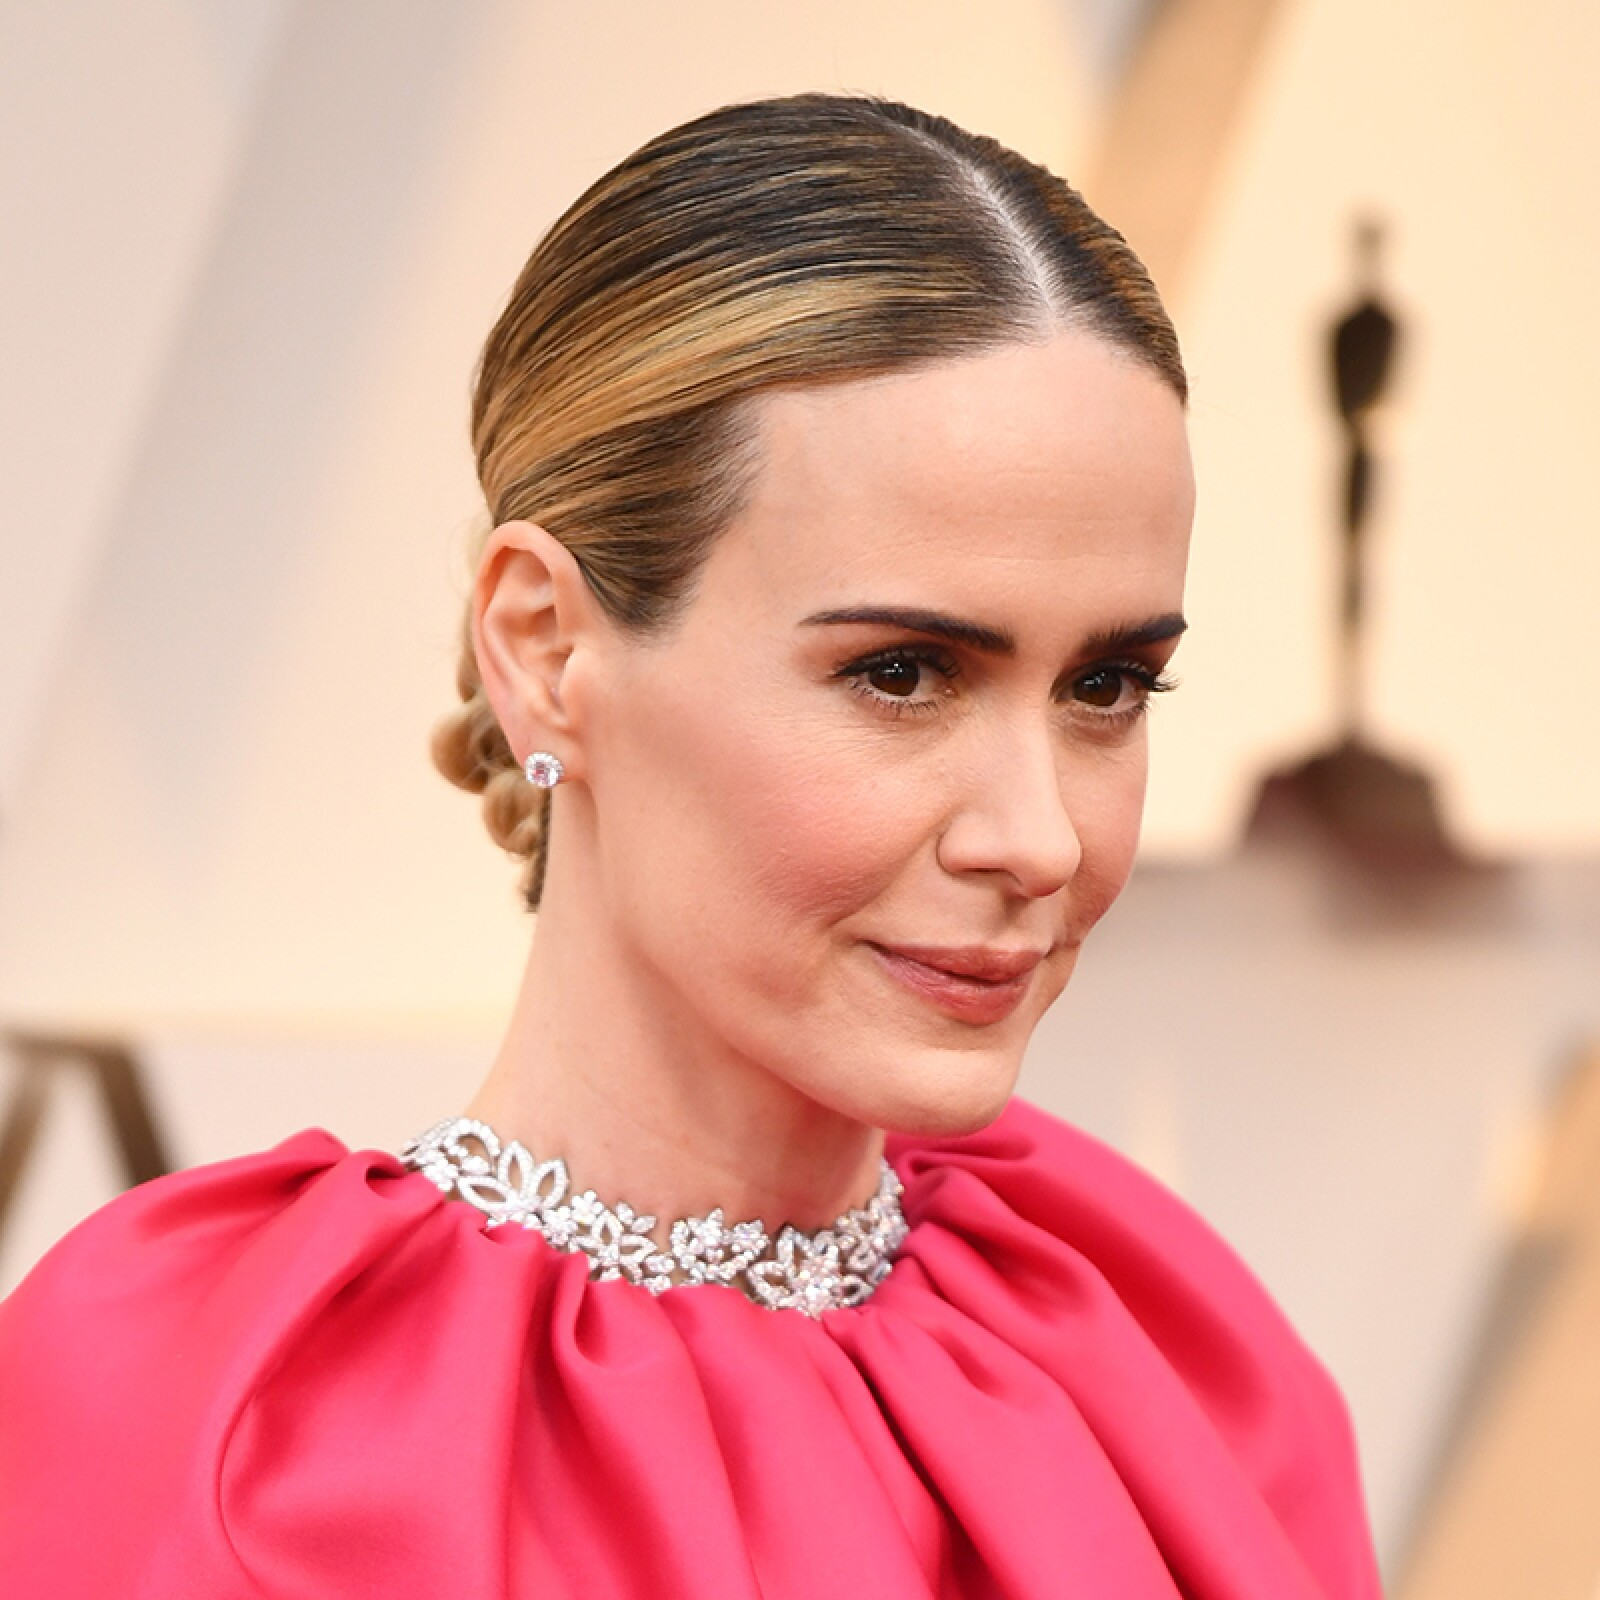 oscares-oscar-hair-looks-alfombra-roja-academy-awards-Sarah-Paulson